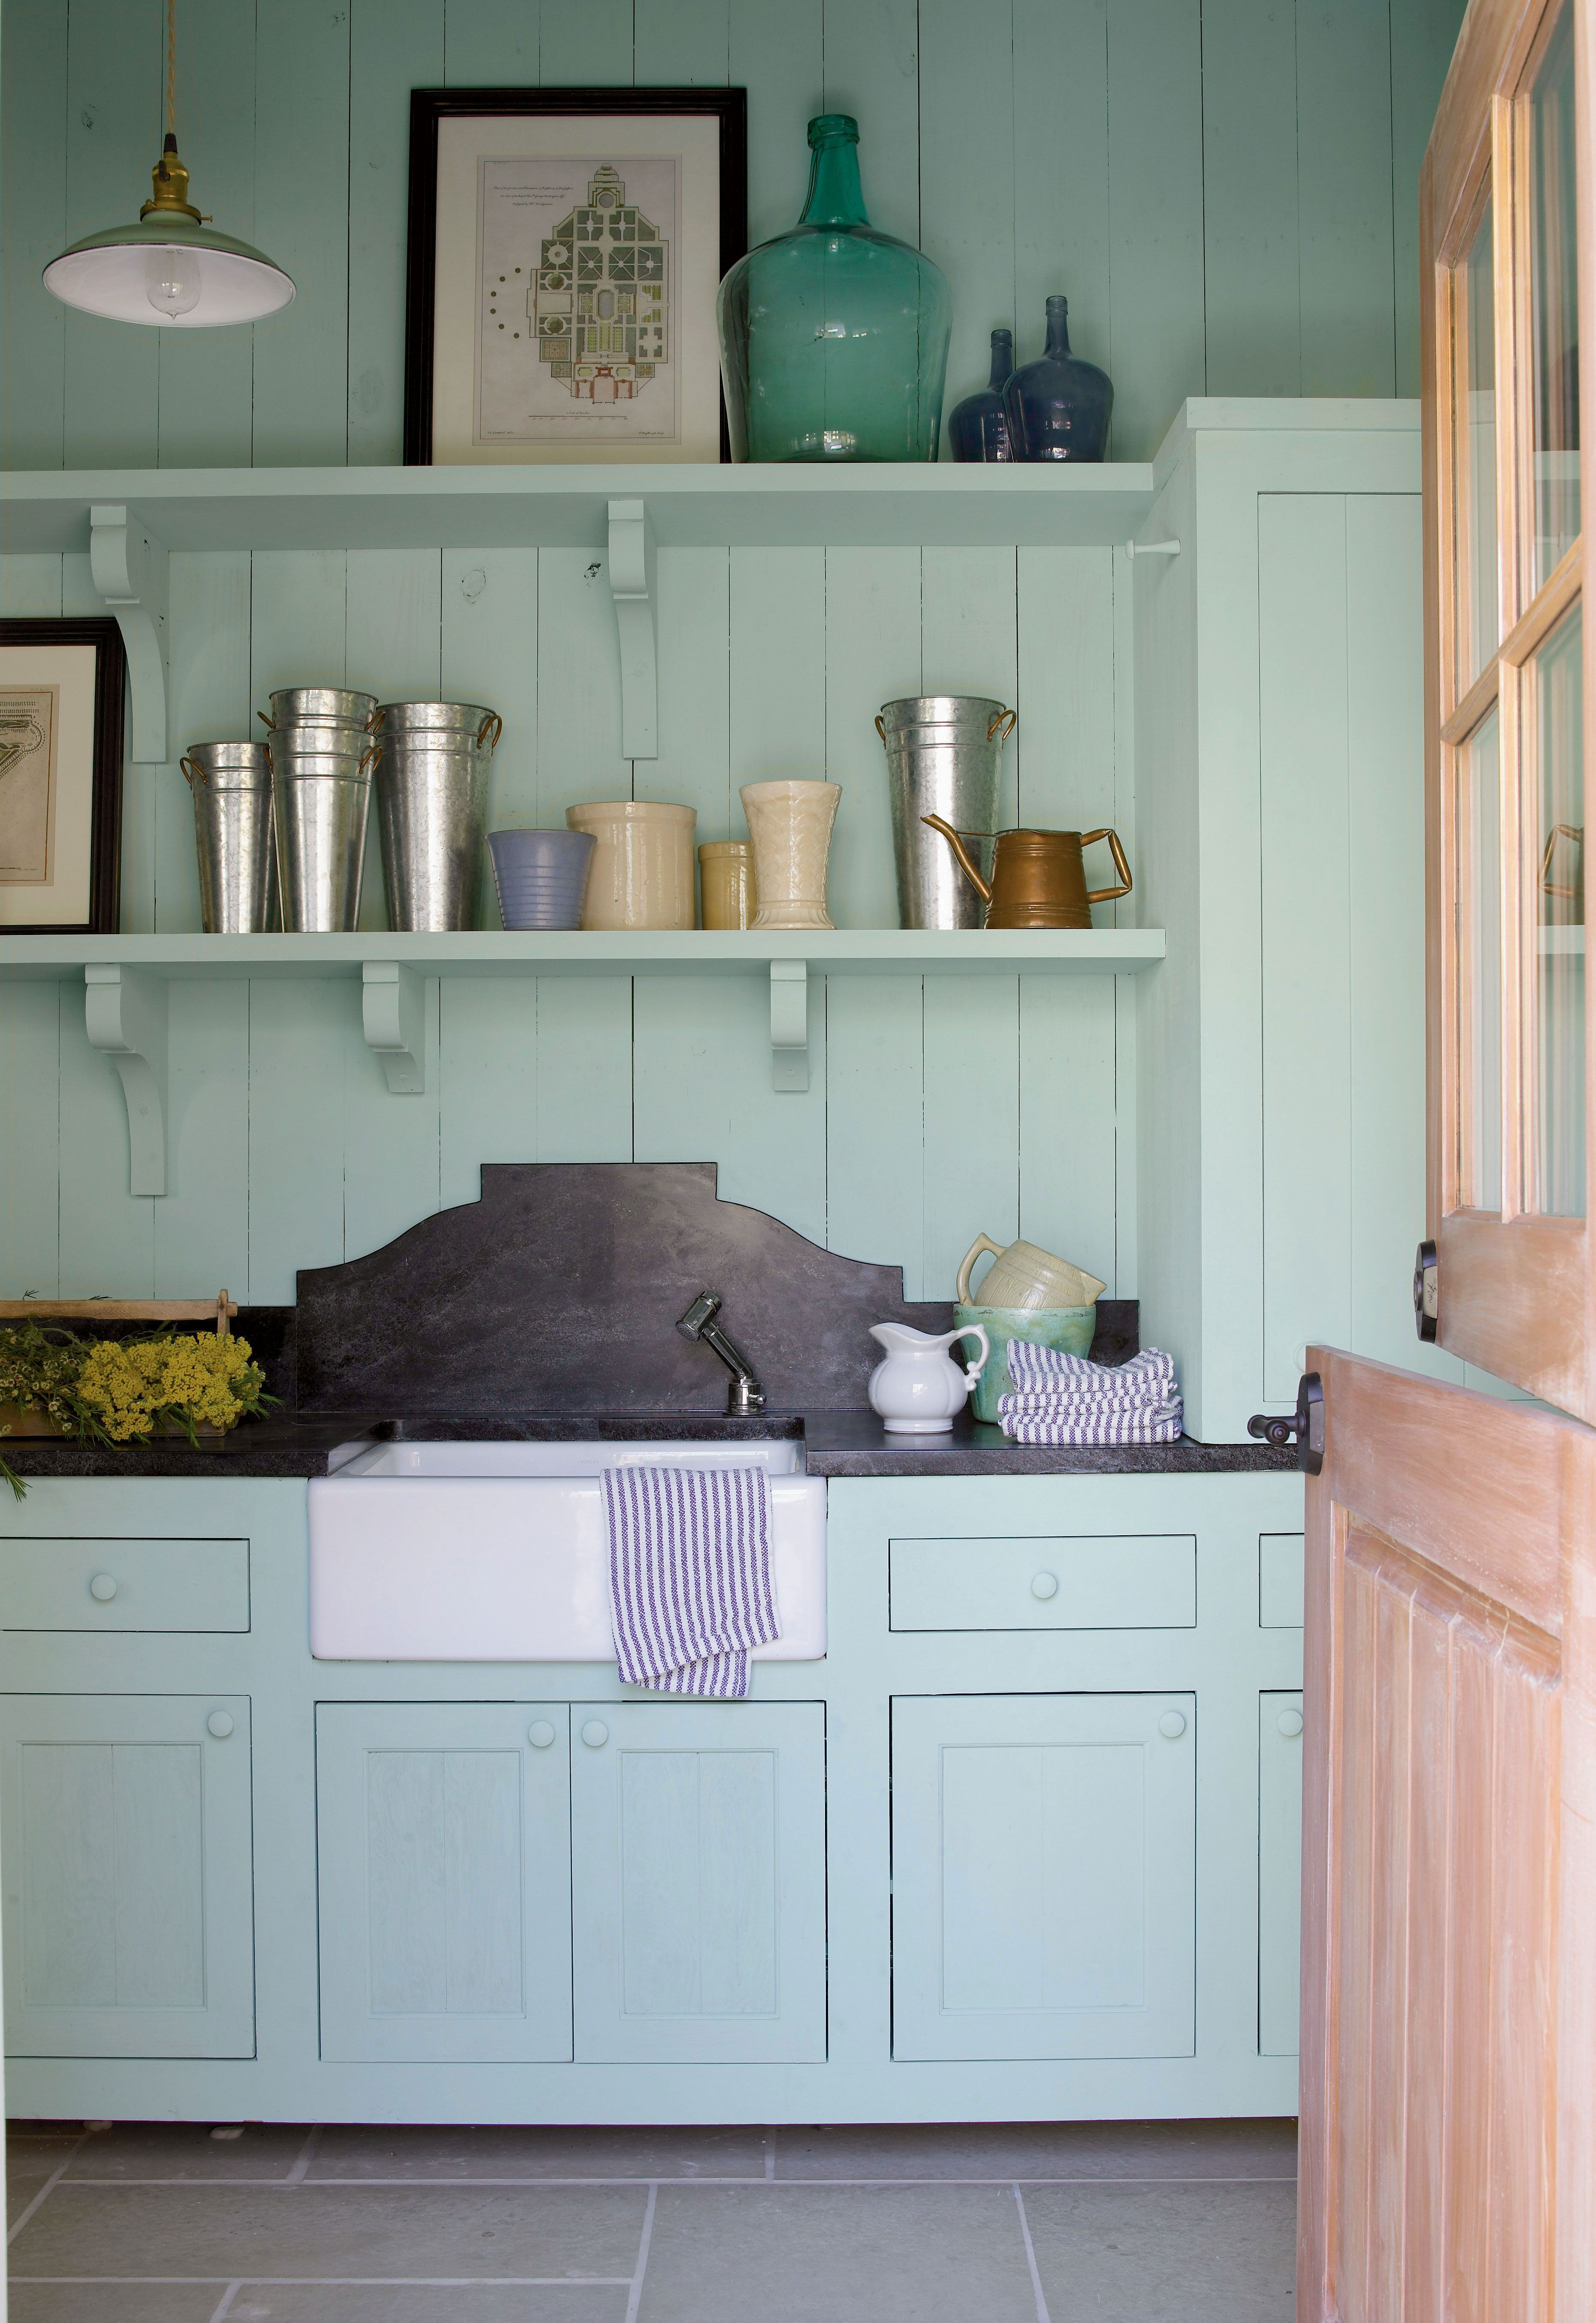 Versatile Laundry Sink   Kitchen remake   Pinterest   Sinks, Apron ...